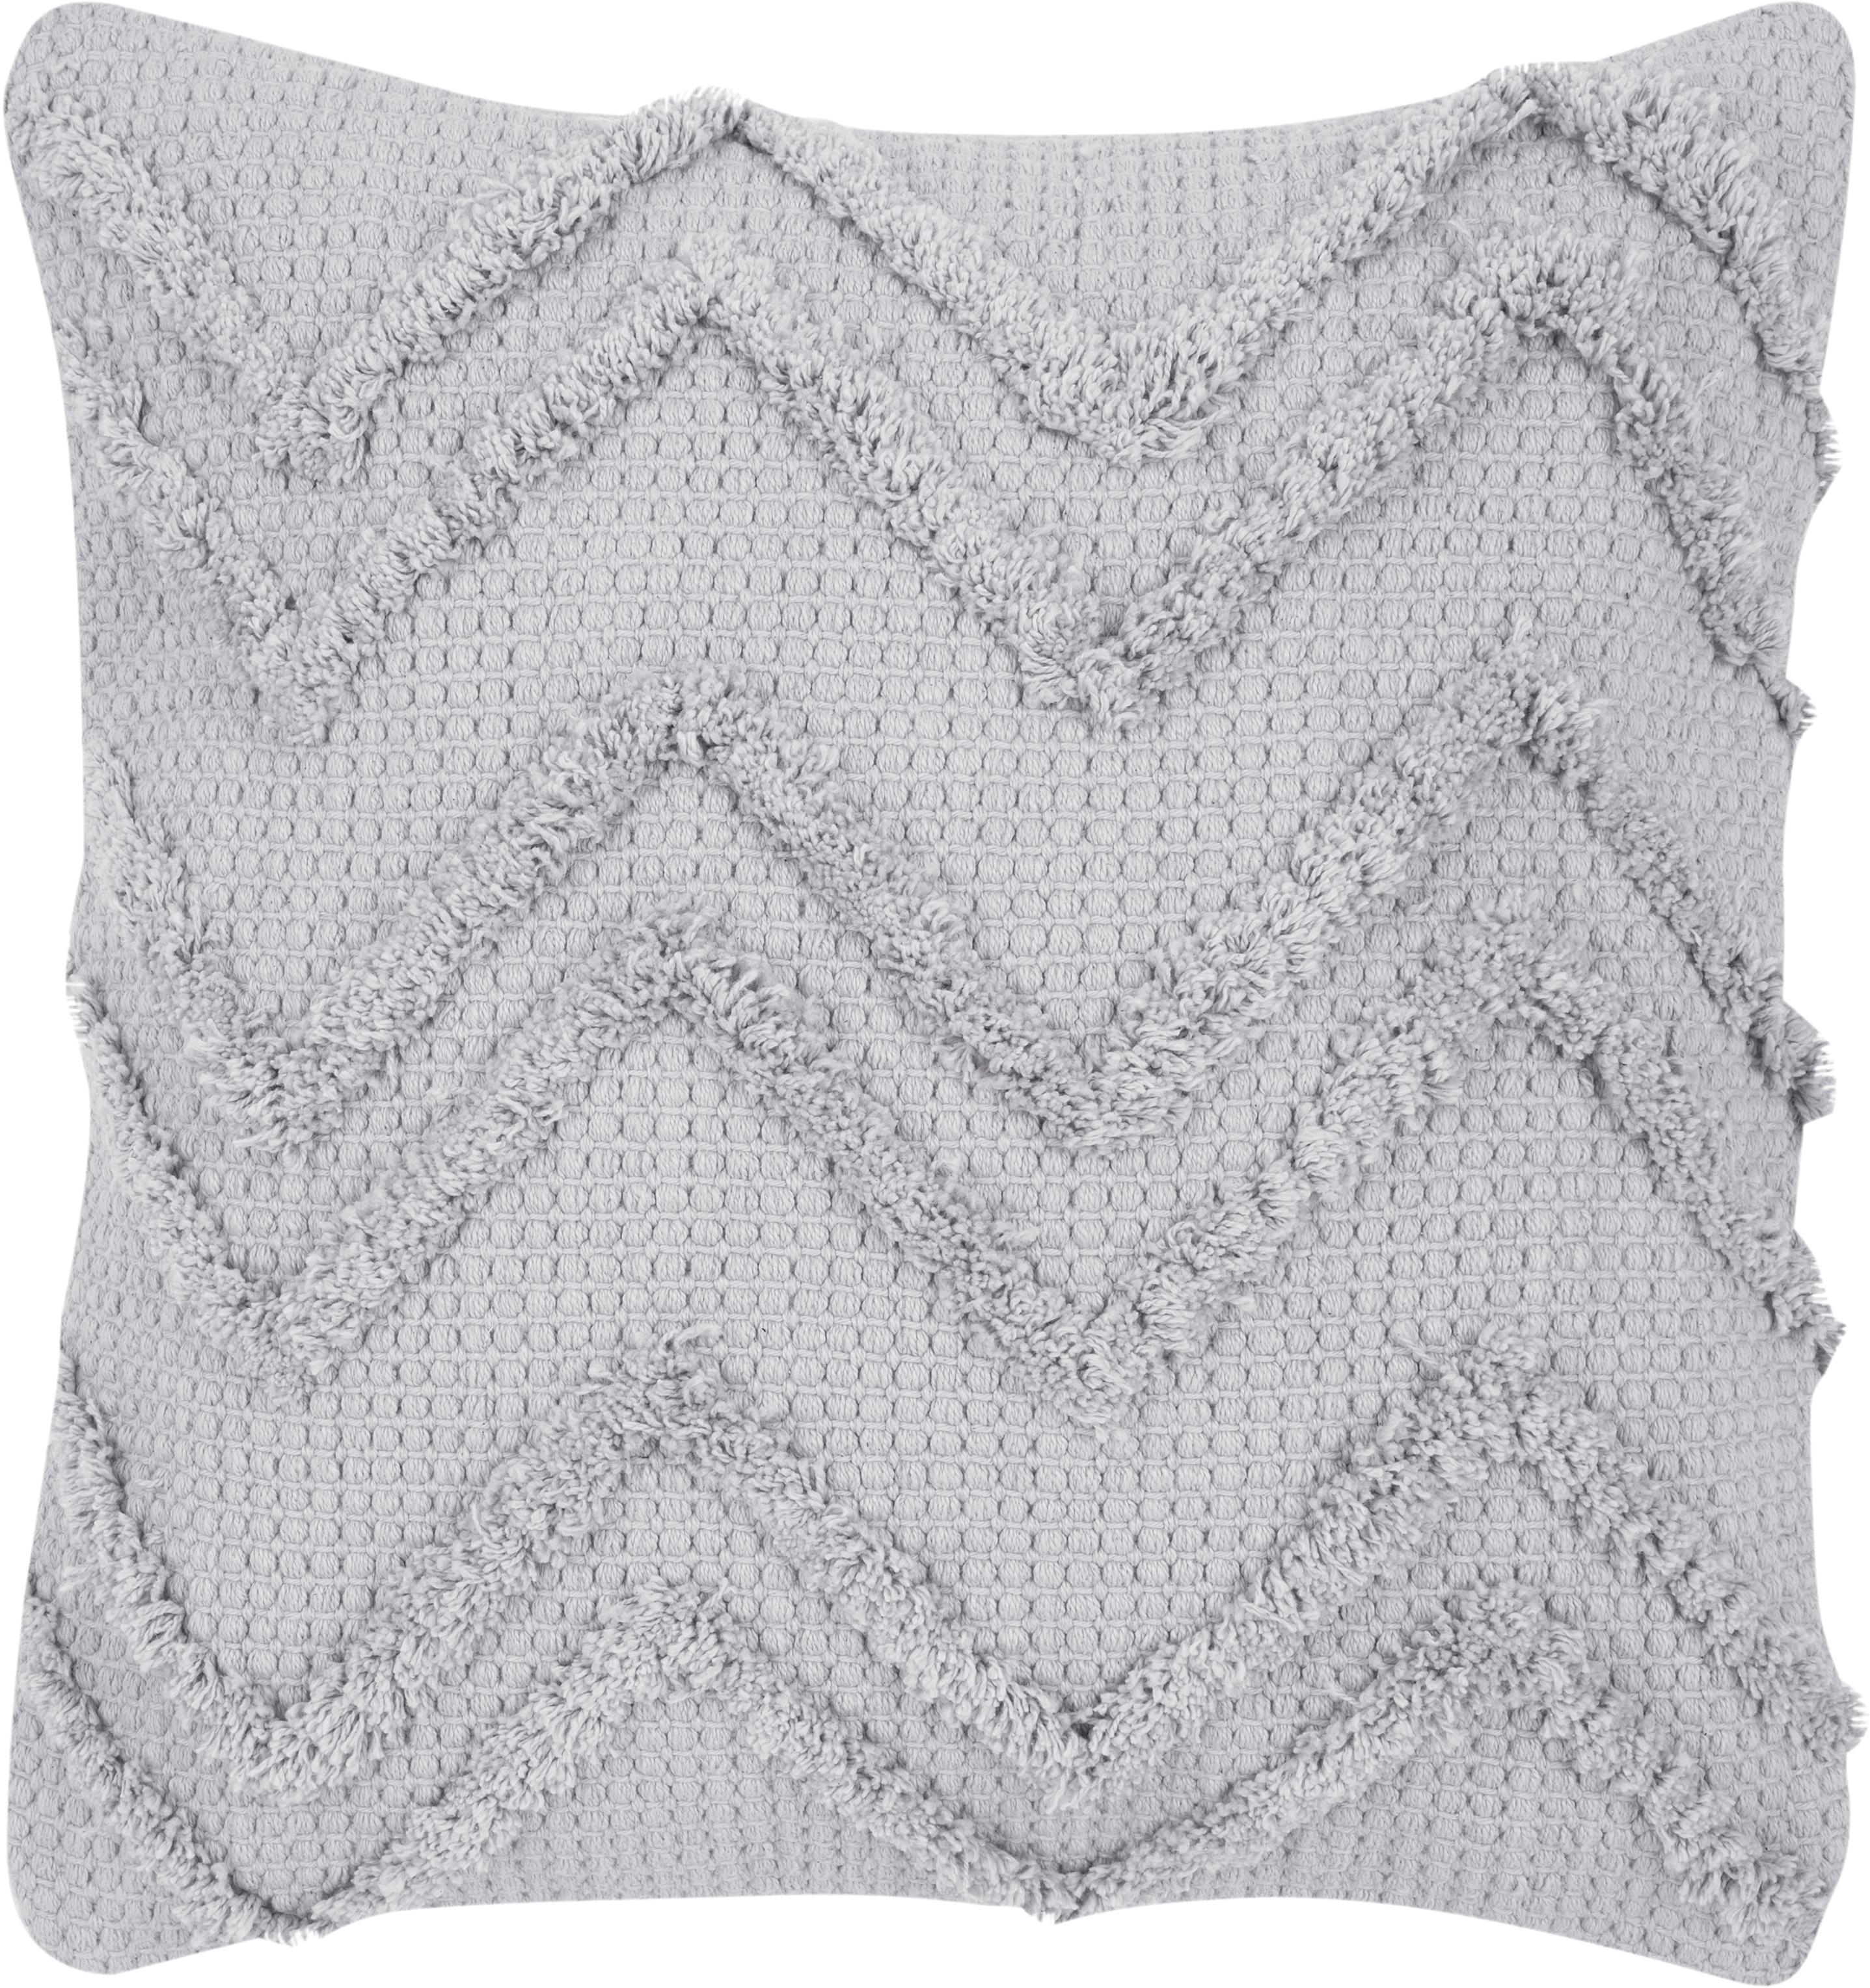 Funda de cojín Akesha, 100%algodón, Gris, An 45 x L 45 cm